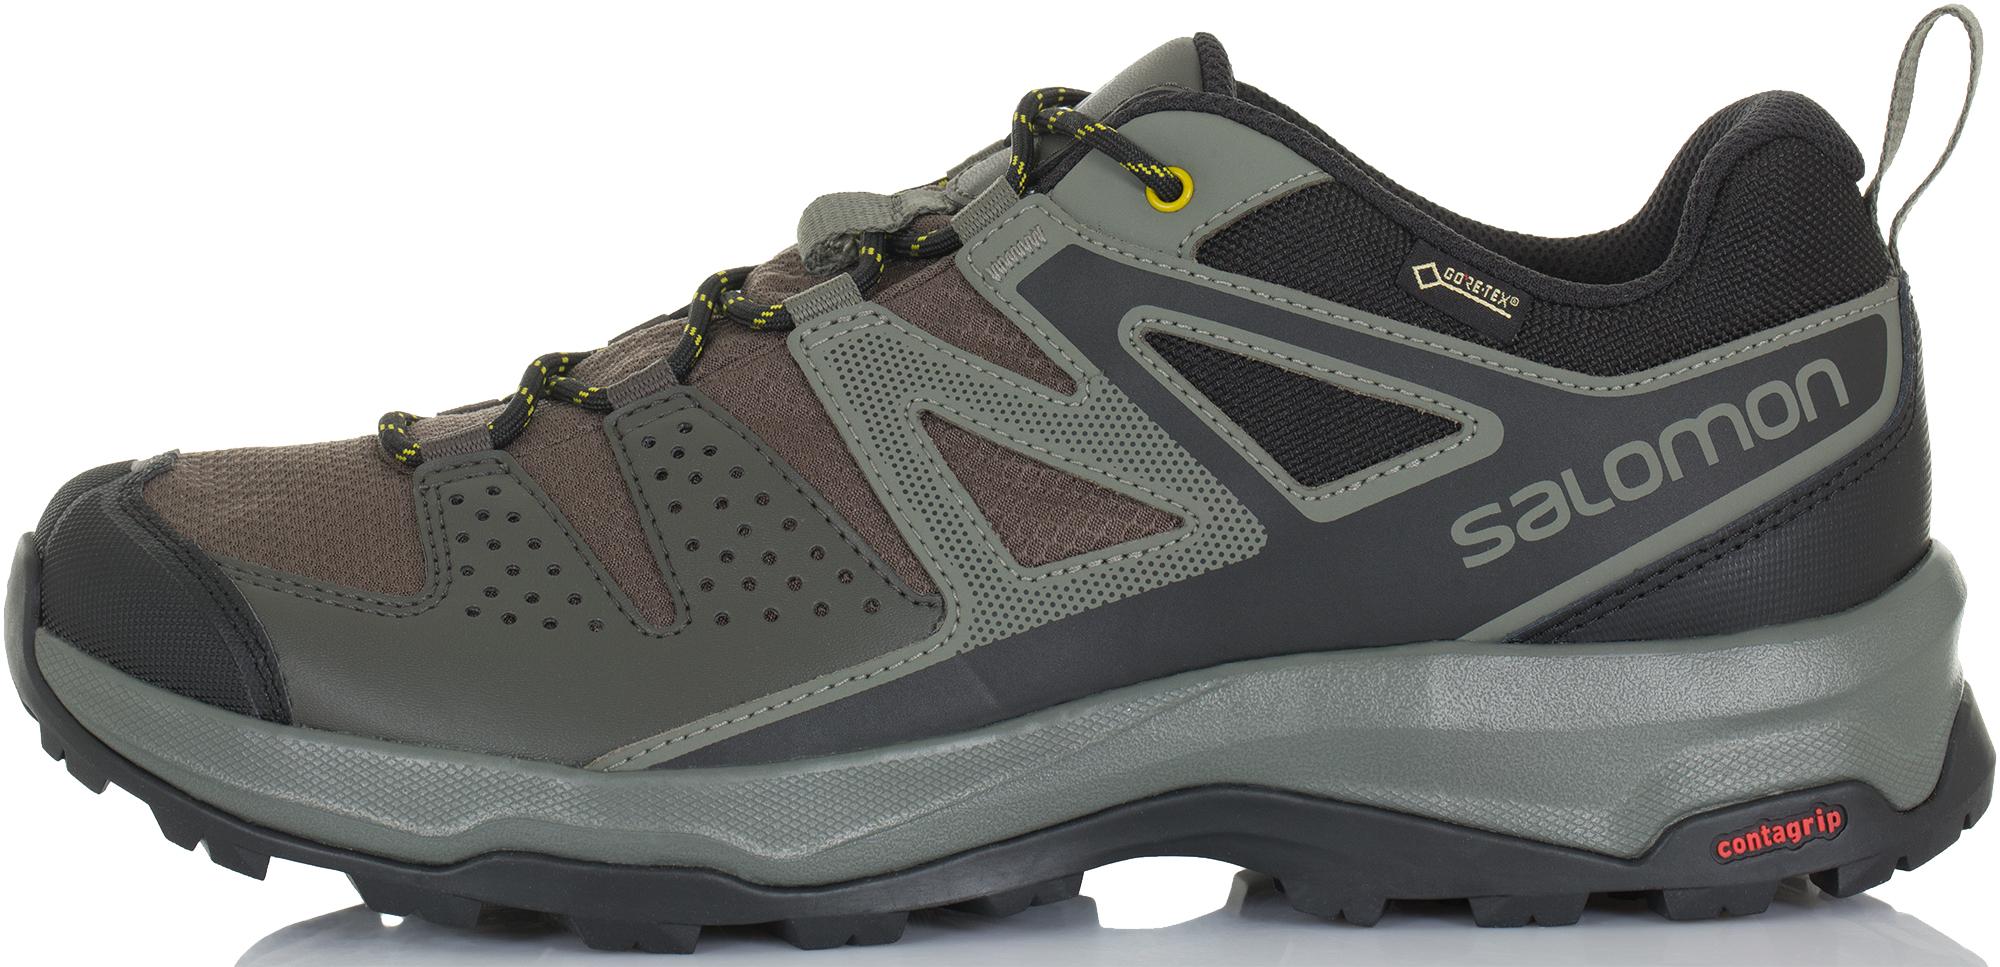 Salomon Полуботинки мужские Salomon X Radiant Gtx, размер 44 ботинки мужские salomon ultra mid gore tex